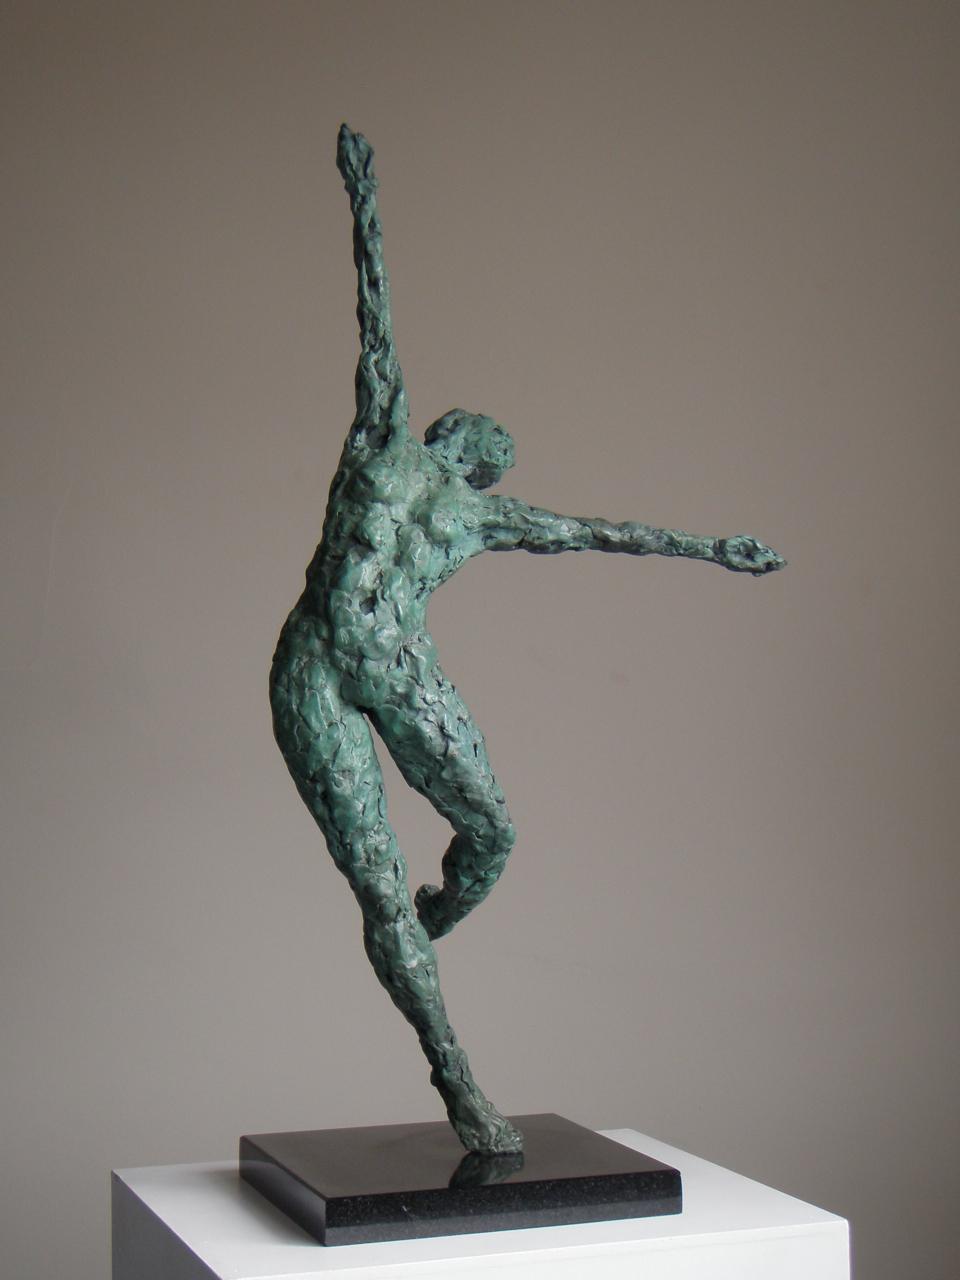 Dance VI - bronze sculpture by Hazel Reeves